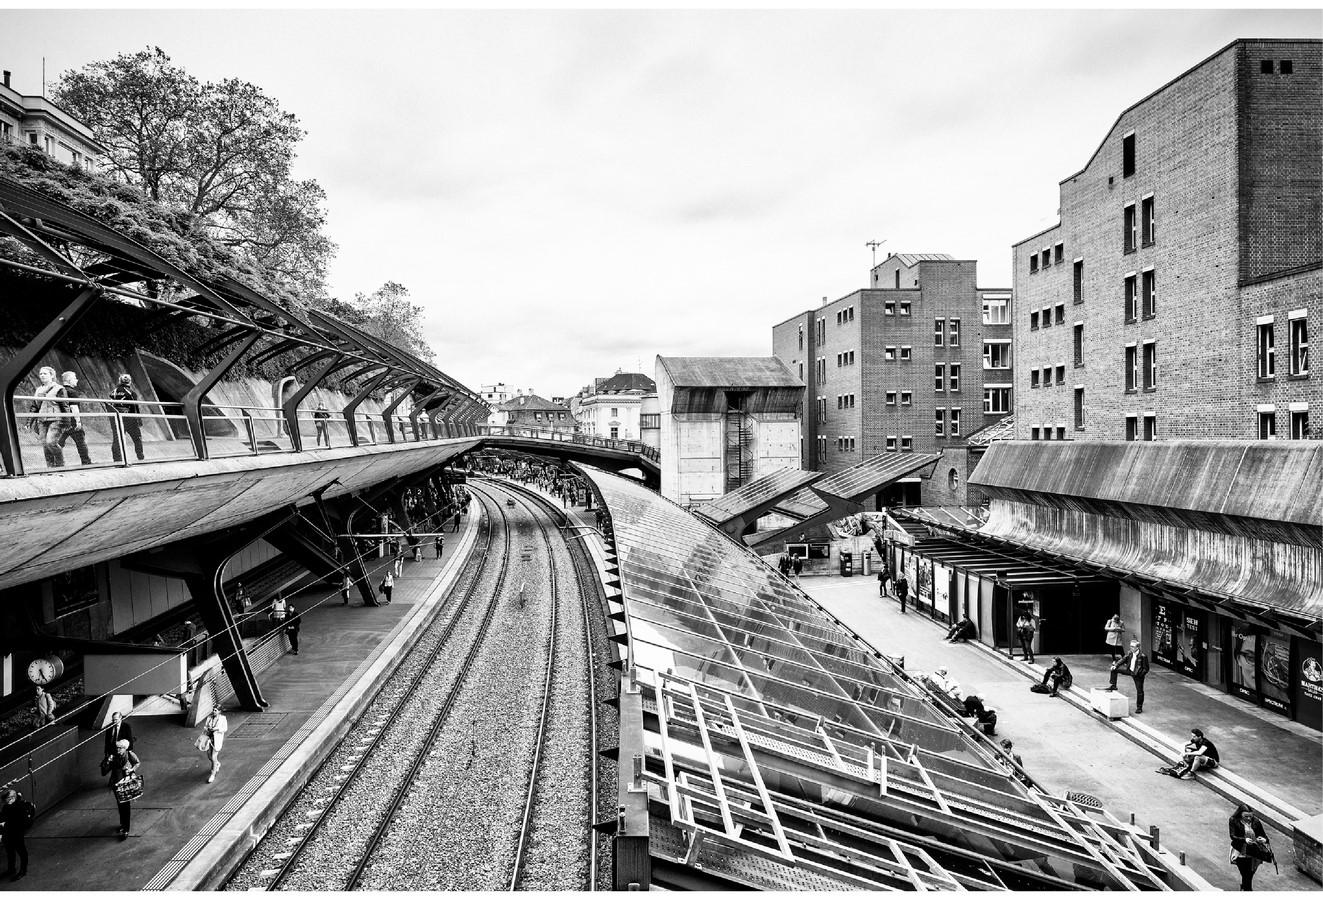 Zürich Stadelhofen Railway Station by Santiago Calatrava: Redefining the existing - Sheet23